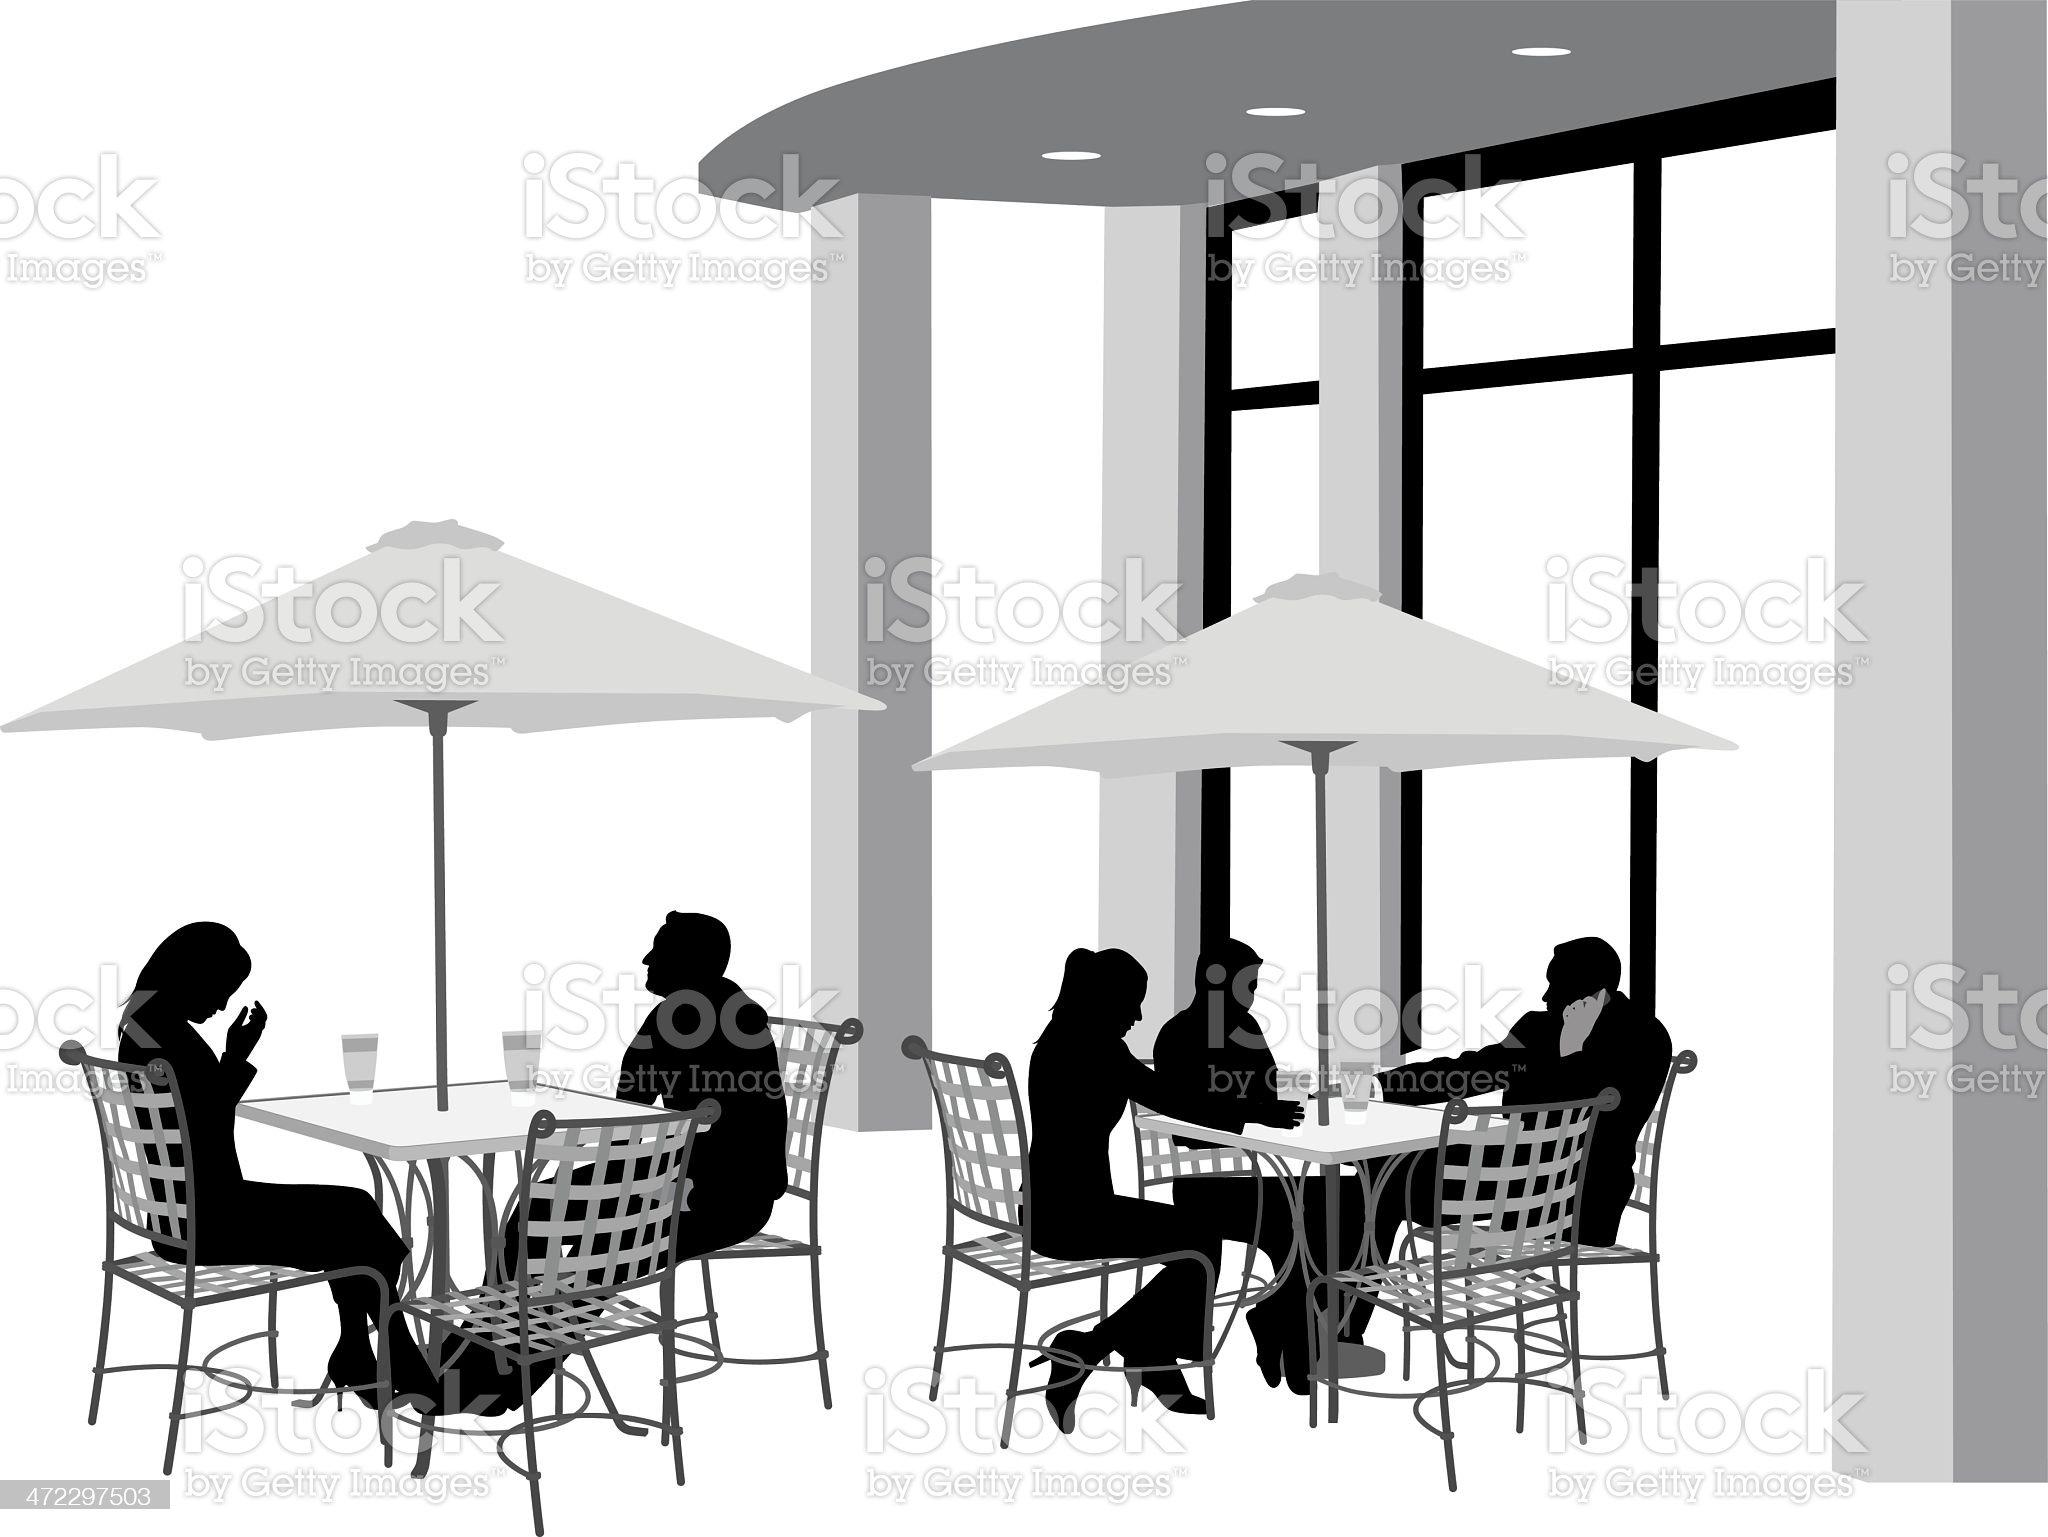 Outdoor Cafe royalty-free stock vector art